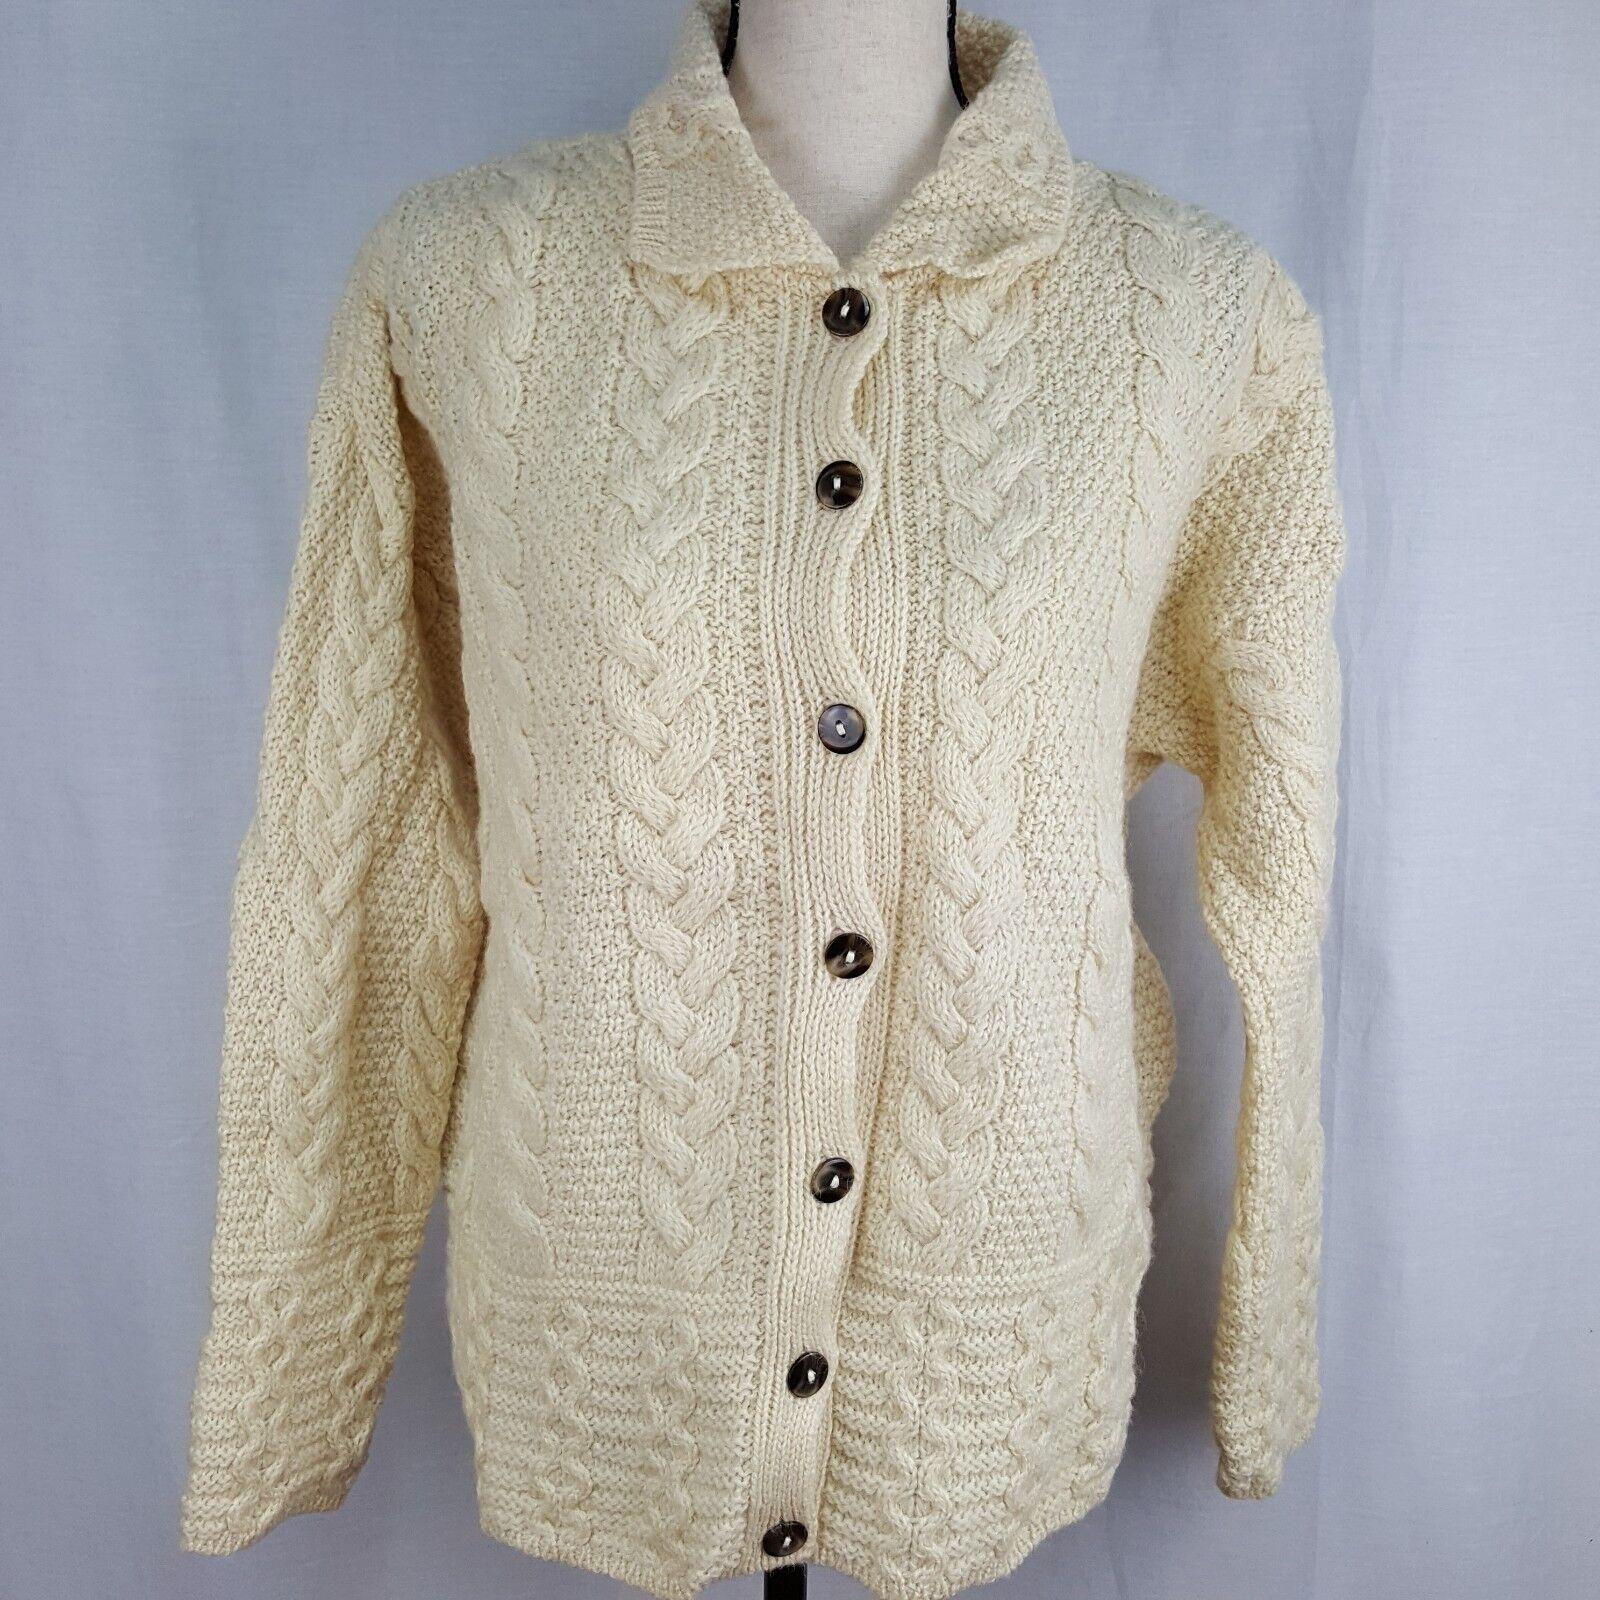 Highland Home Industries Medium Sweater Cream Fisherman Wool Aran